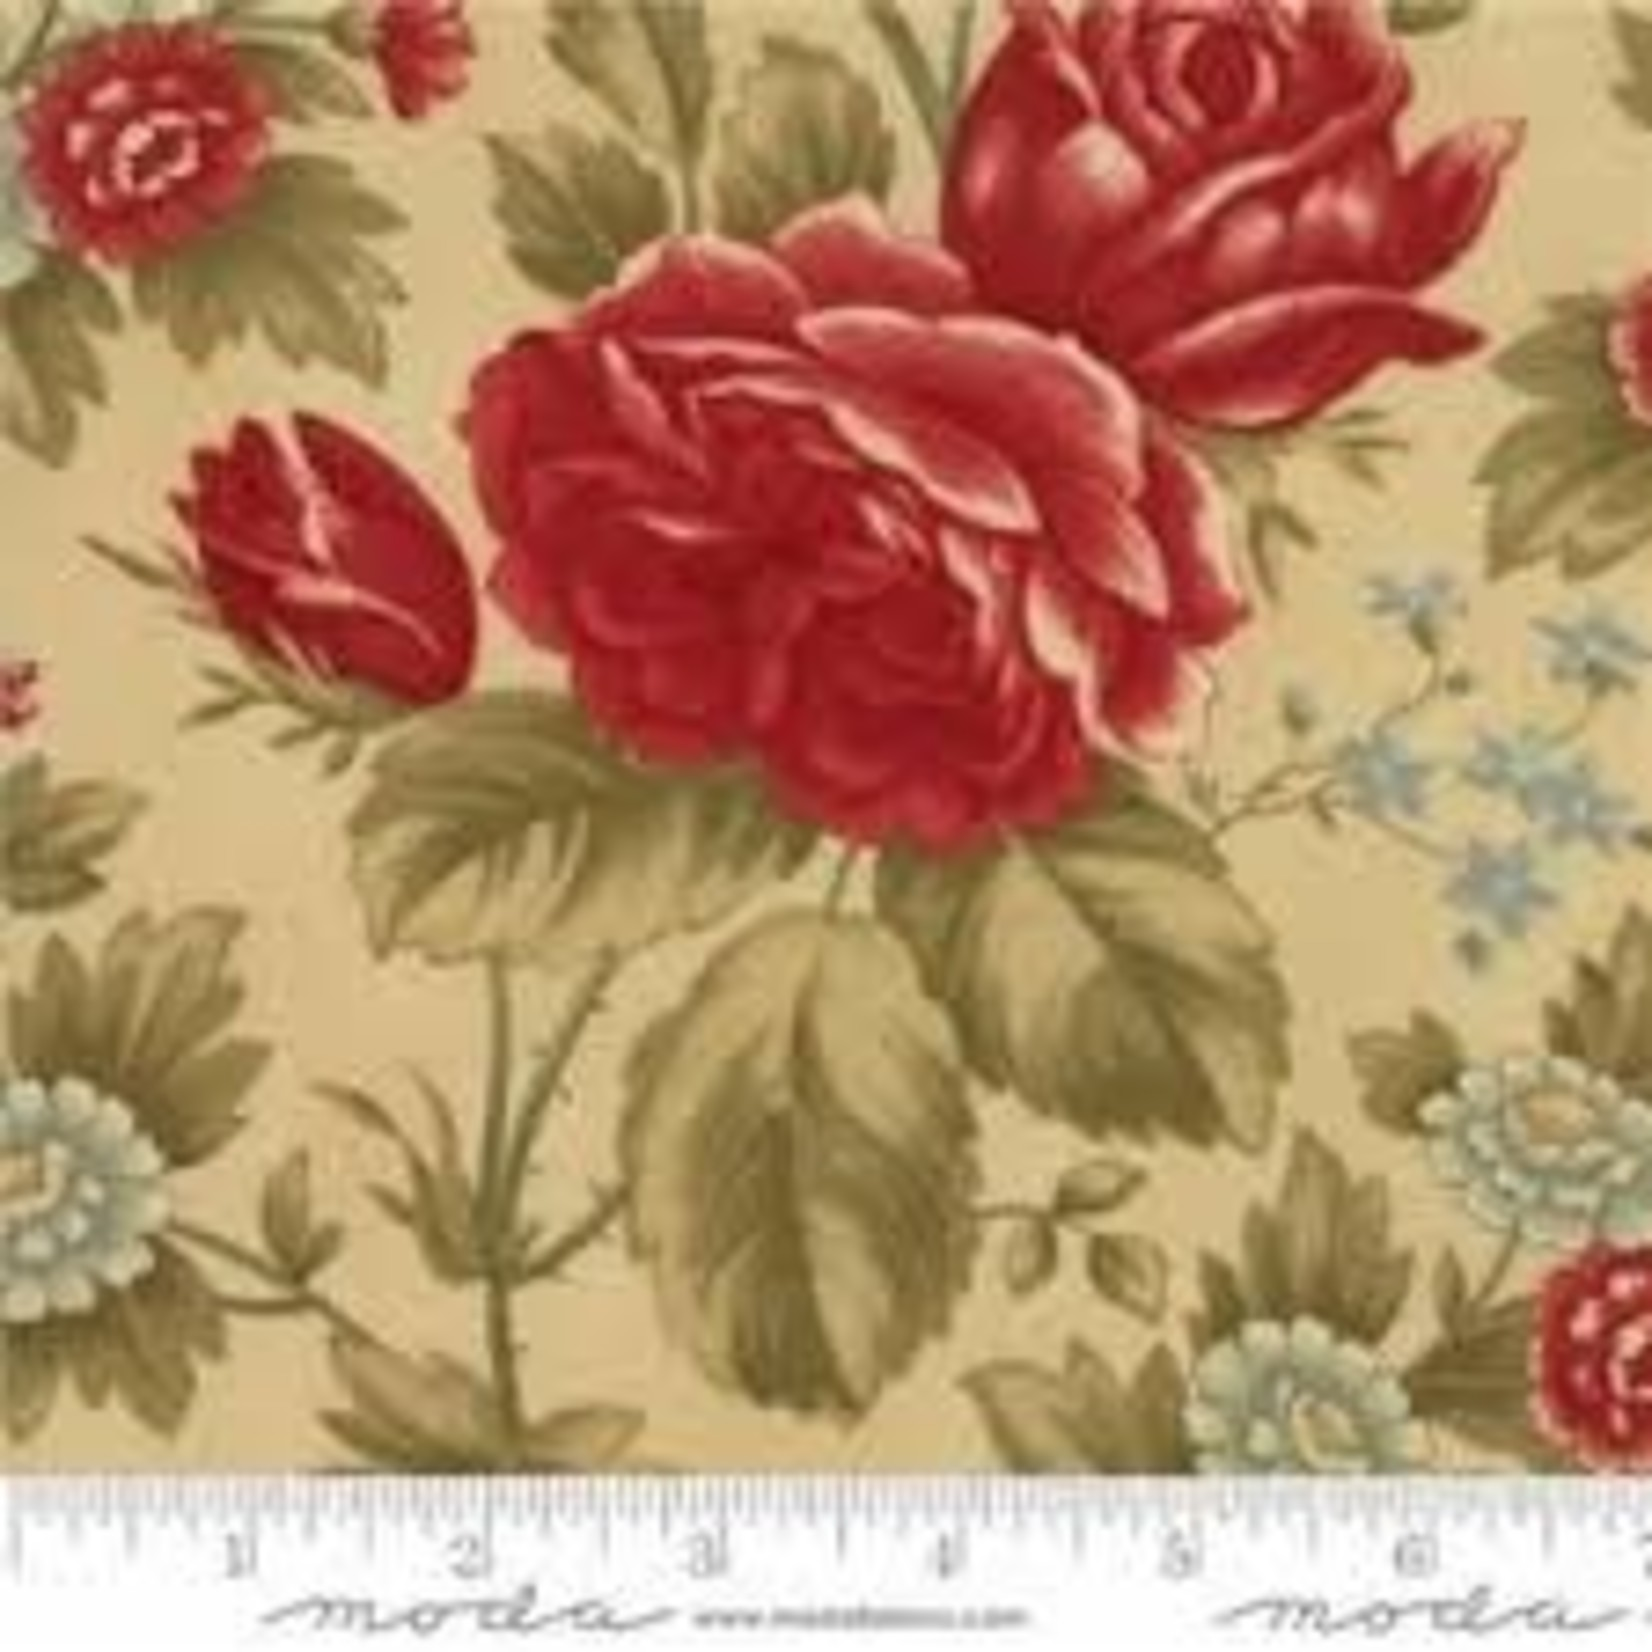 Moda 3 Sisters - Rosewood - Floral Roses - Vanilla